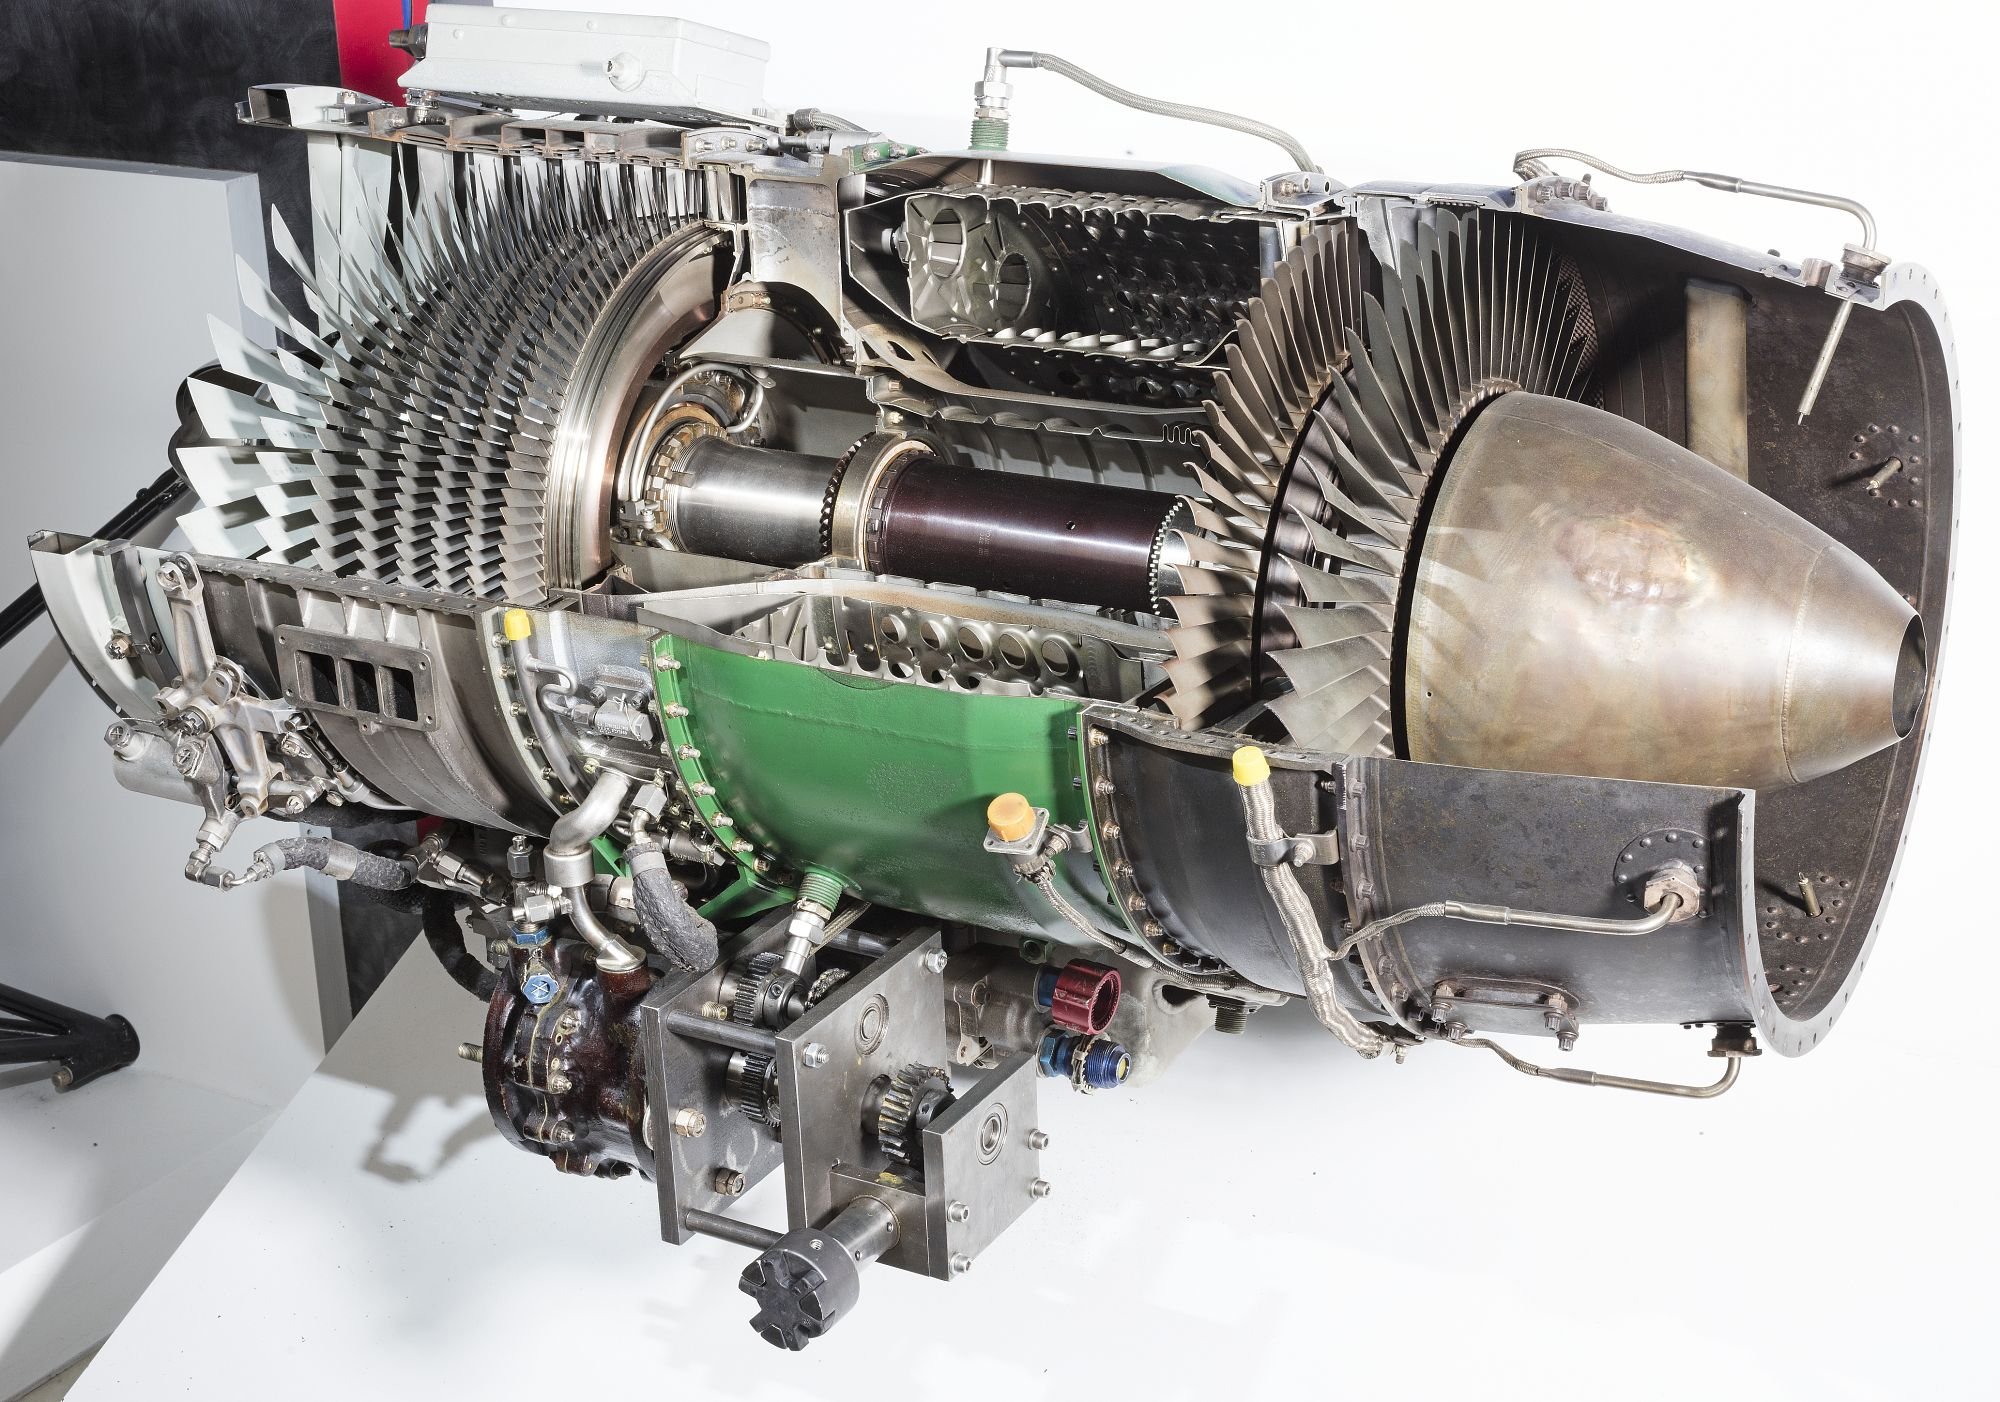 General Electric J85 Ge 17a Turbojet Engine Cutaway